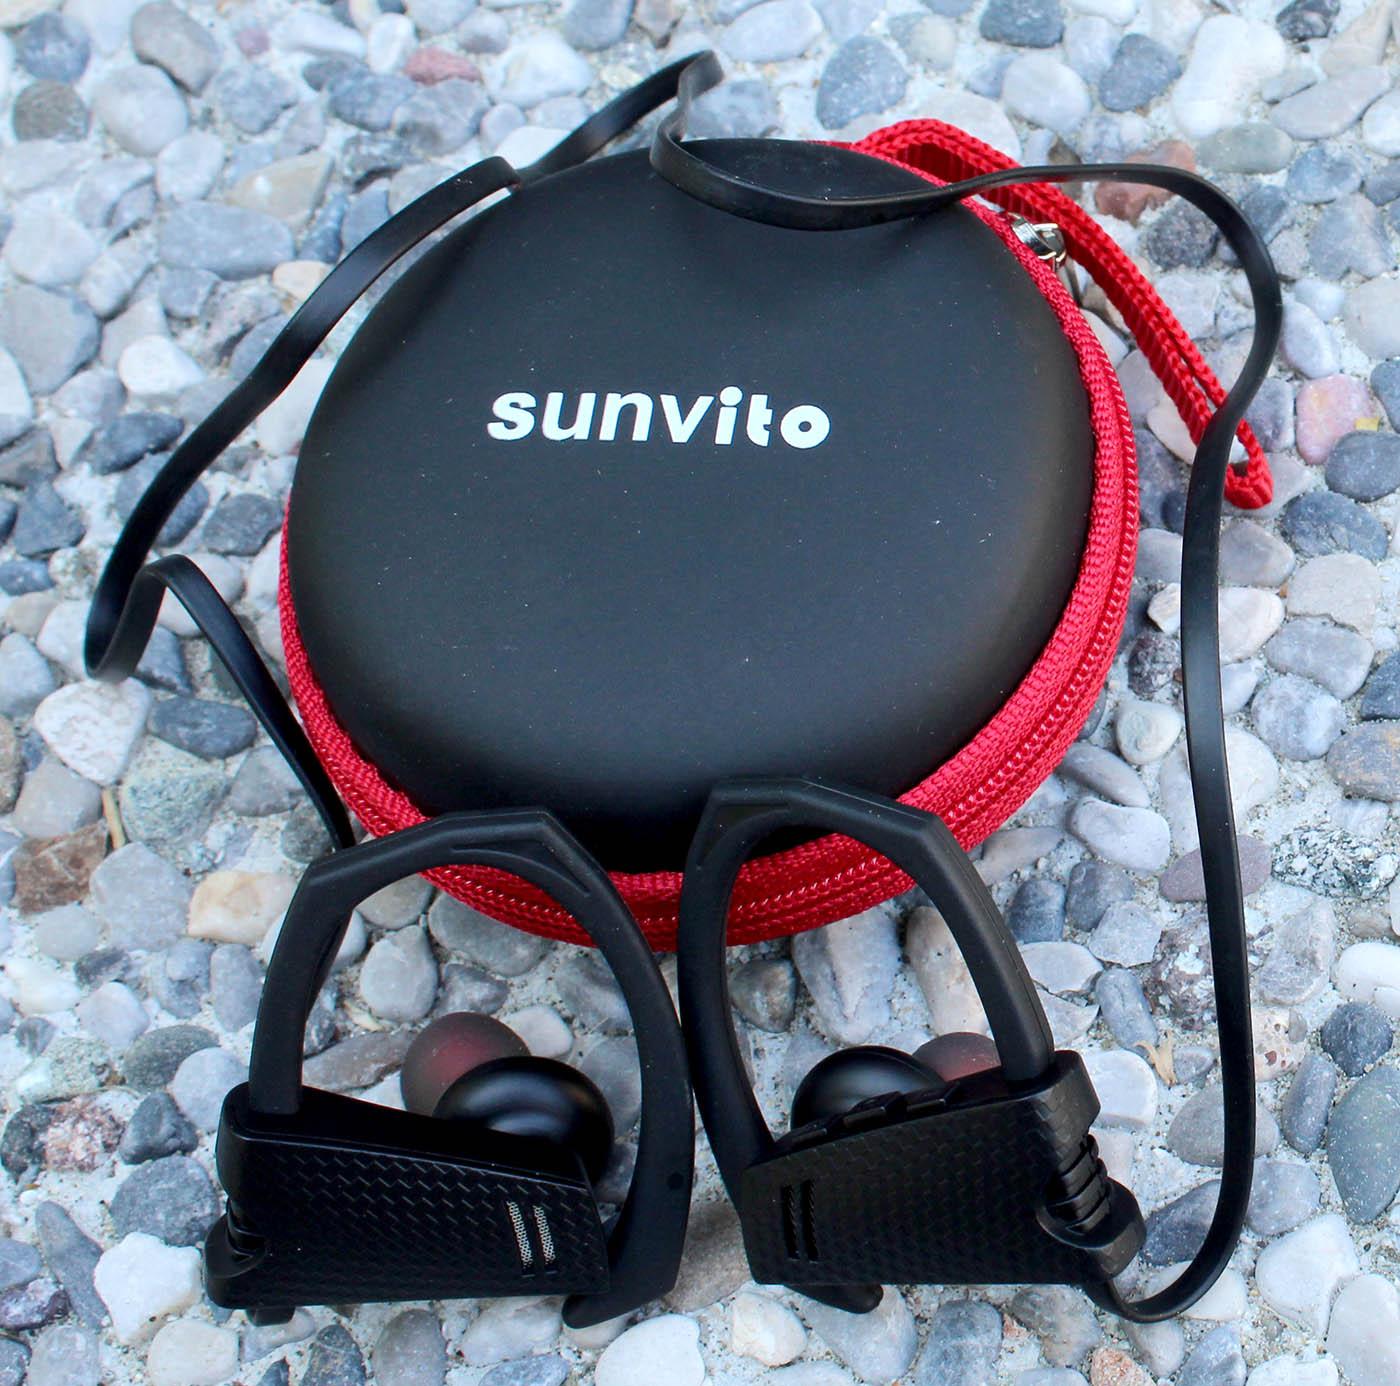 Cuffie Bluetooth Sunvito SVTQ9